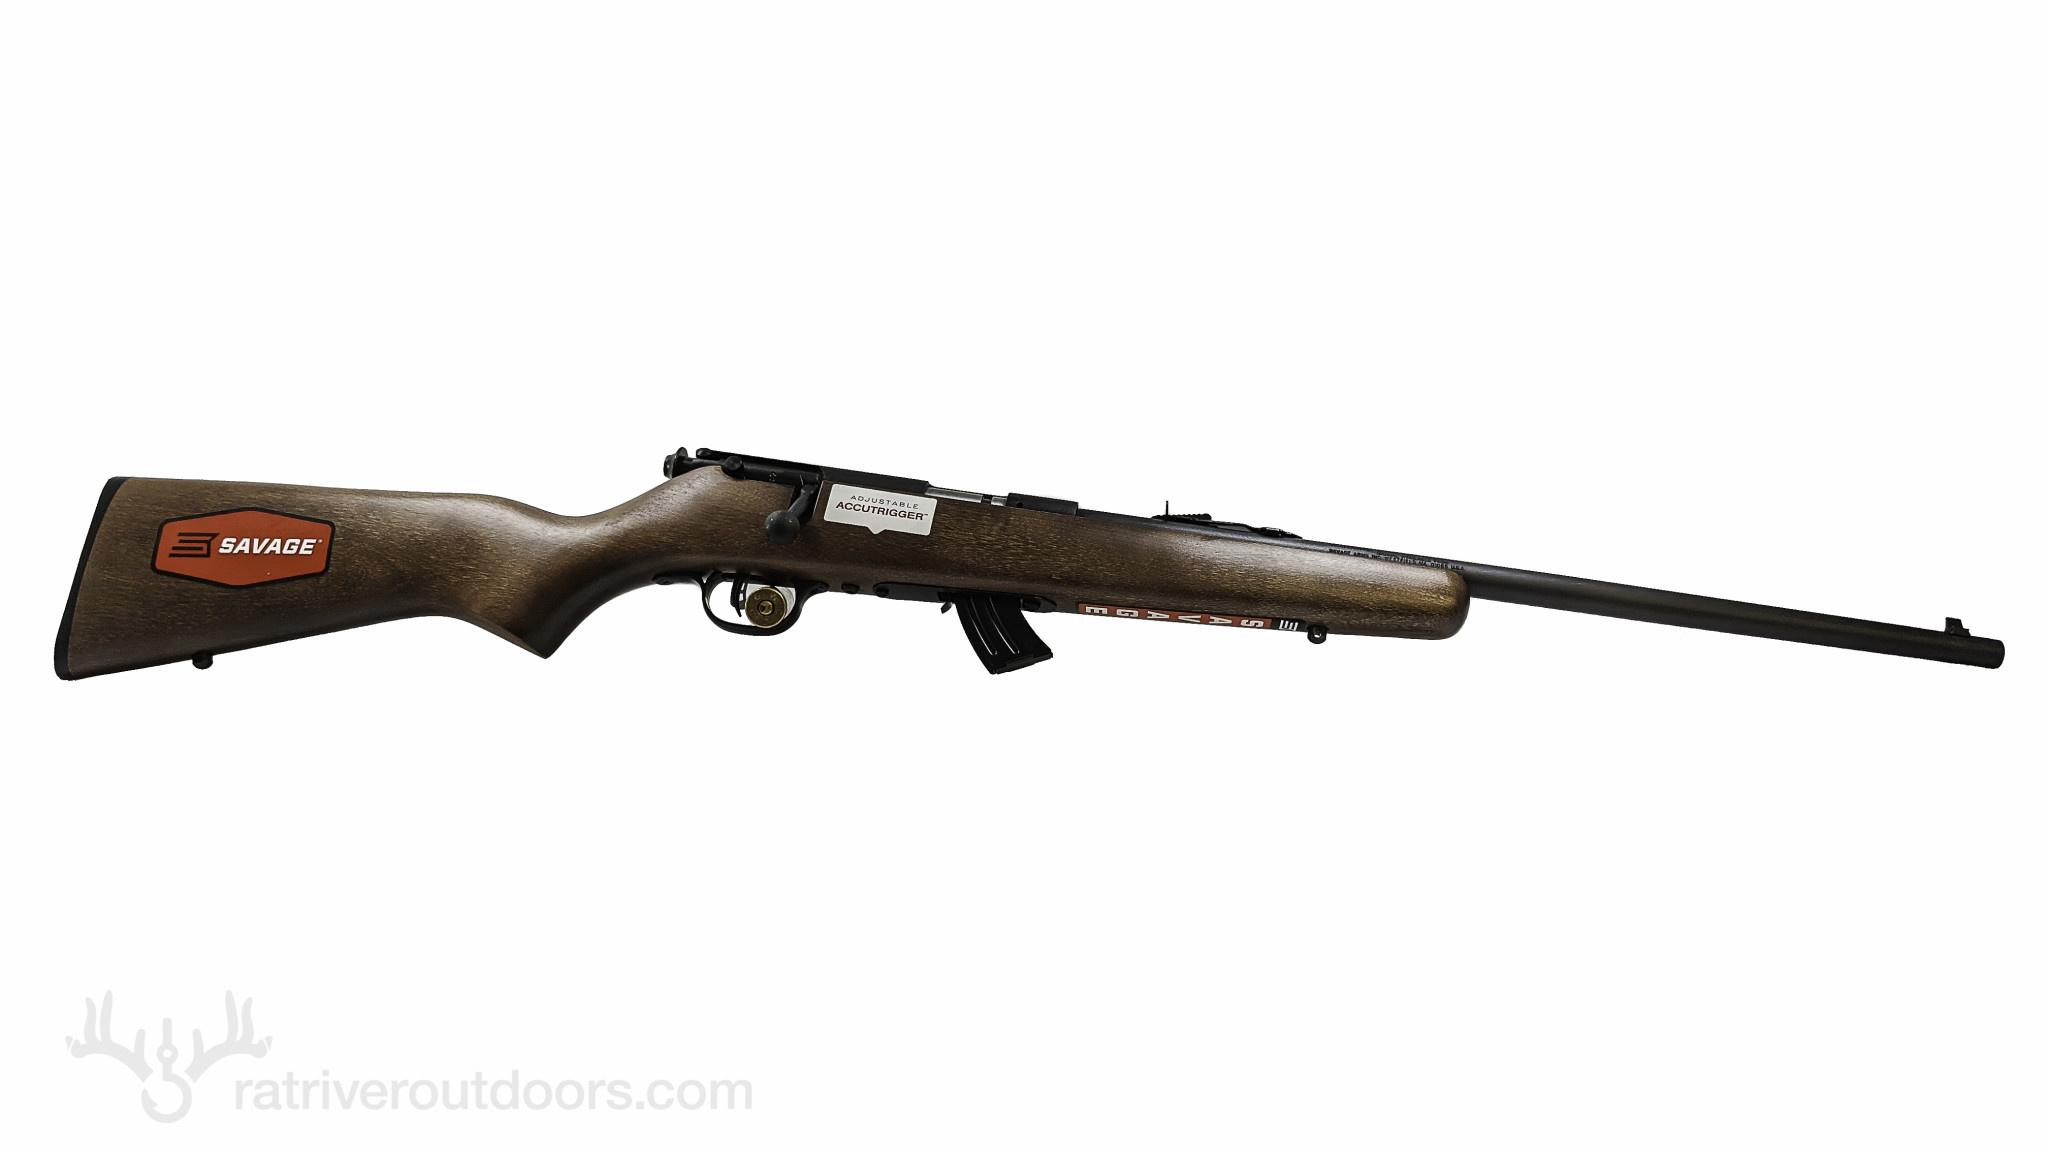 Savage Mark II GY 22LR Youth Blued/Wood